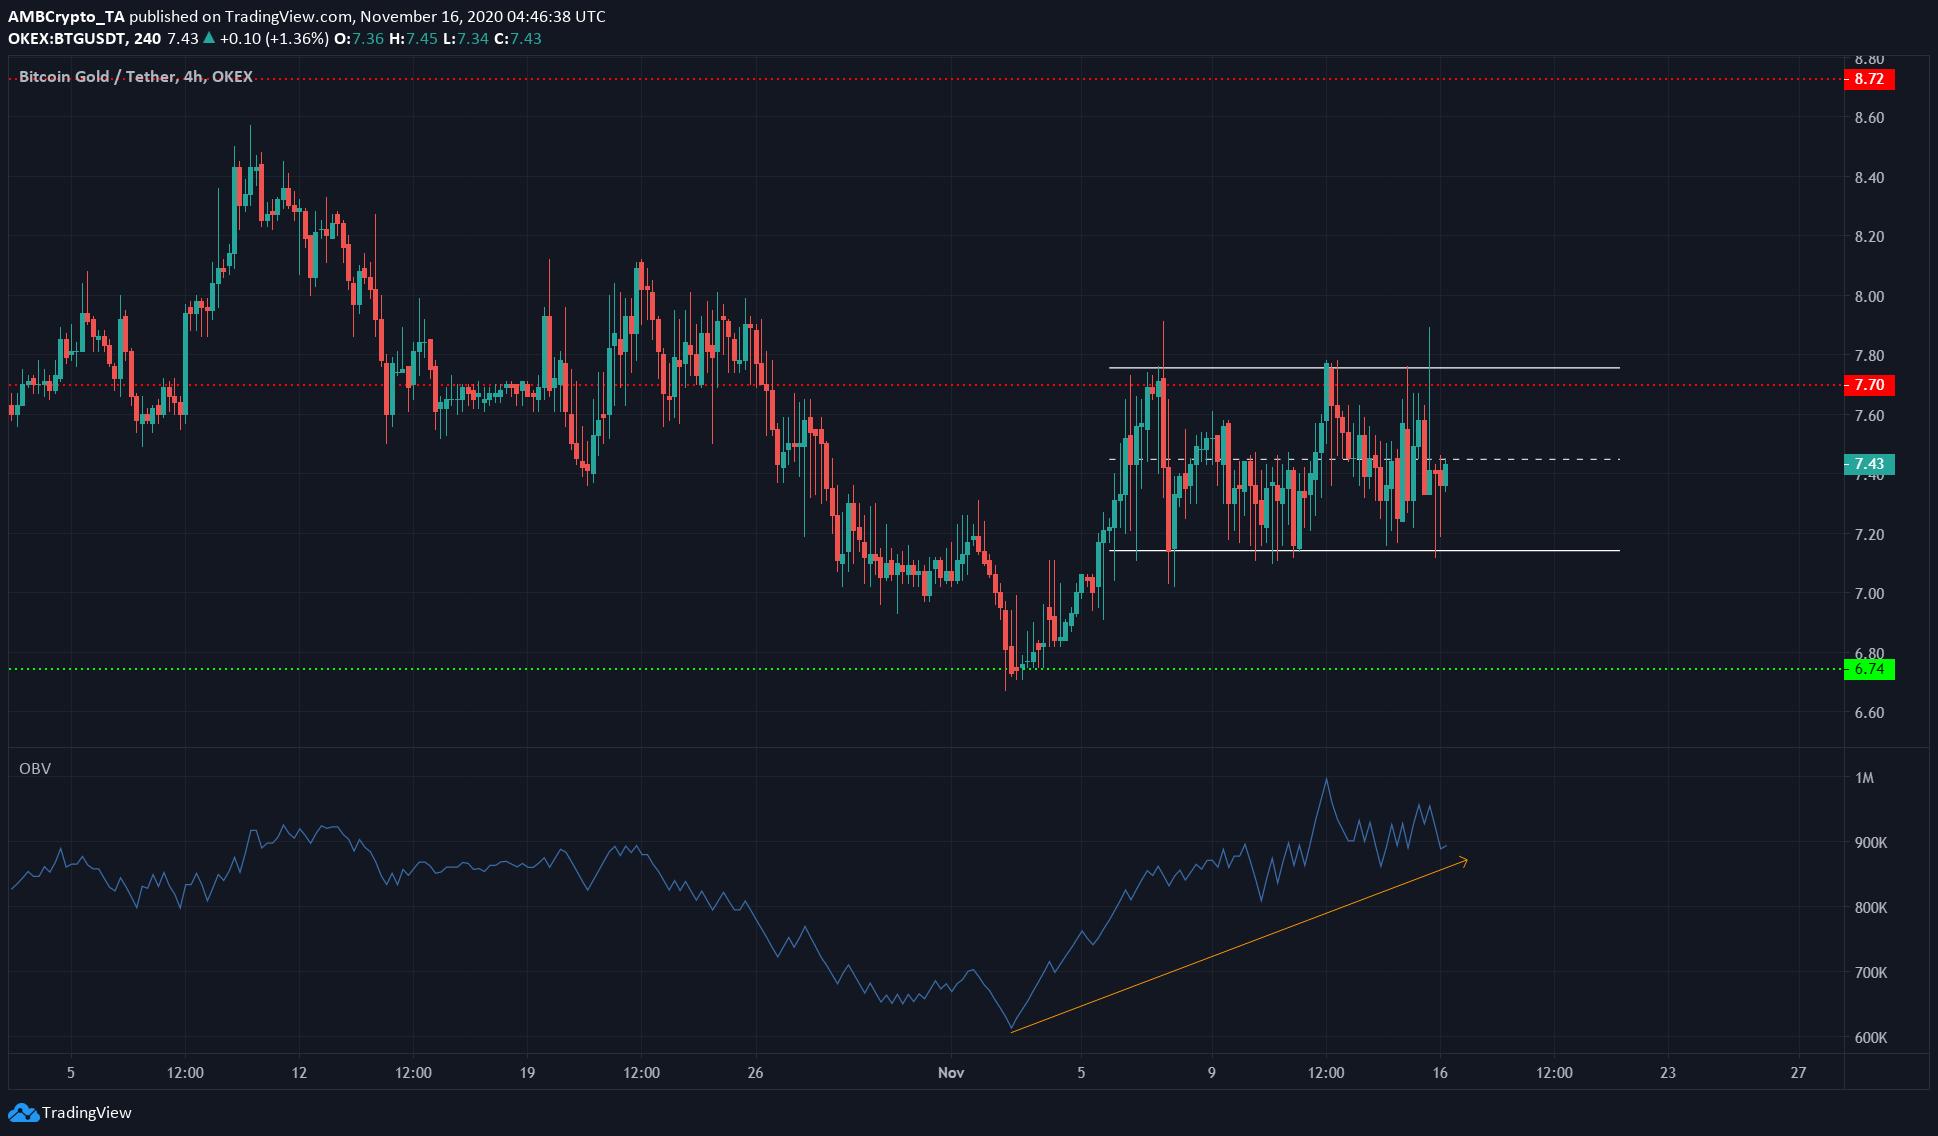 Stellar Lumens, Bitcoin Gold, FTX Token Price Analysis: 16 November